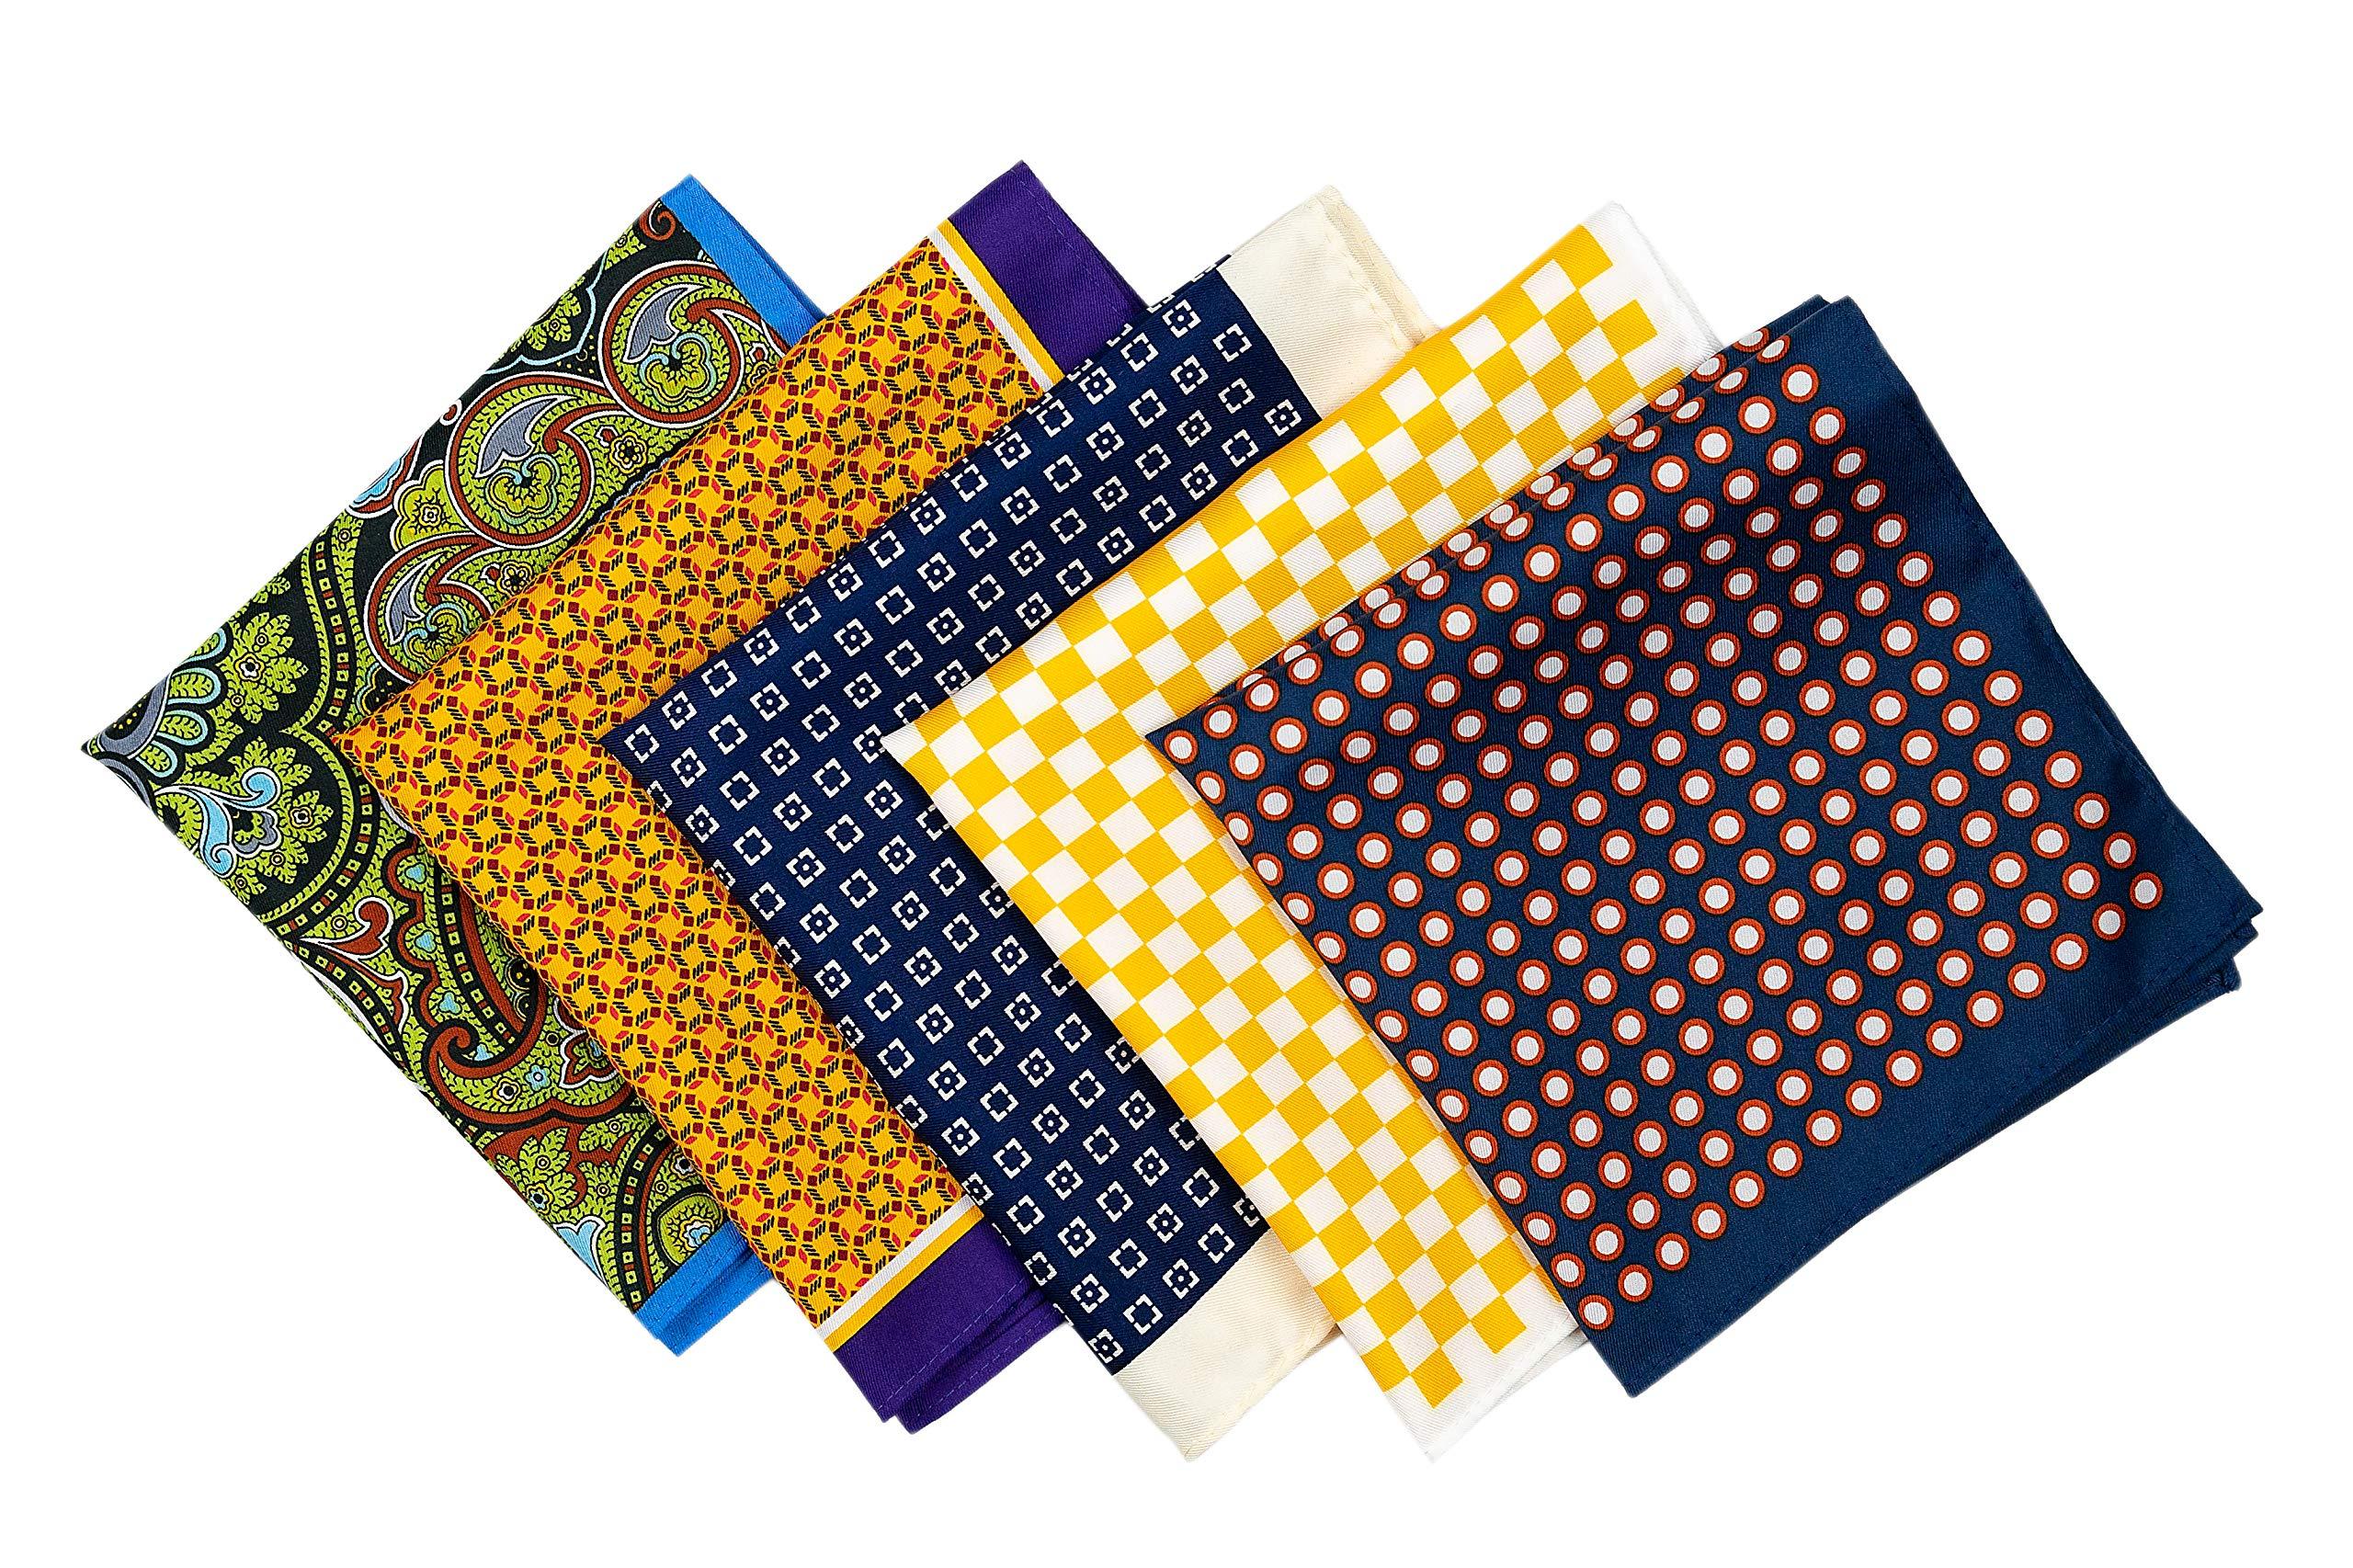 RAAVYA 5 Pcs Men's Pocket Squares Set Assorted Handkerchief Multicolored